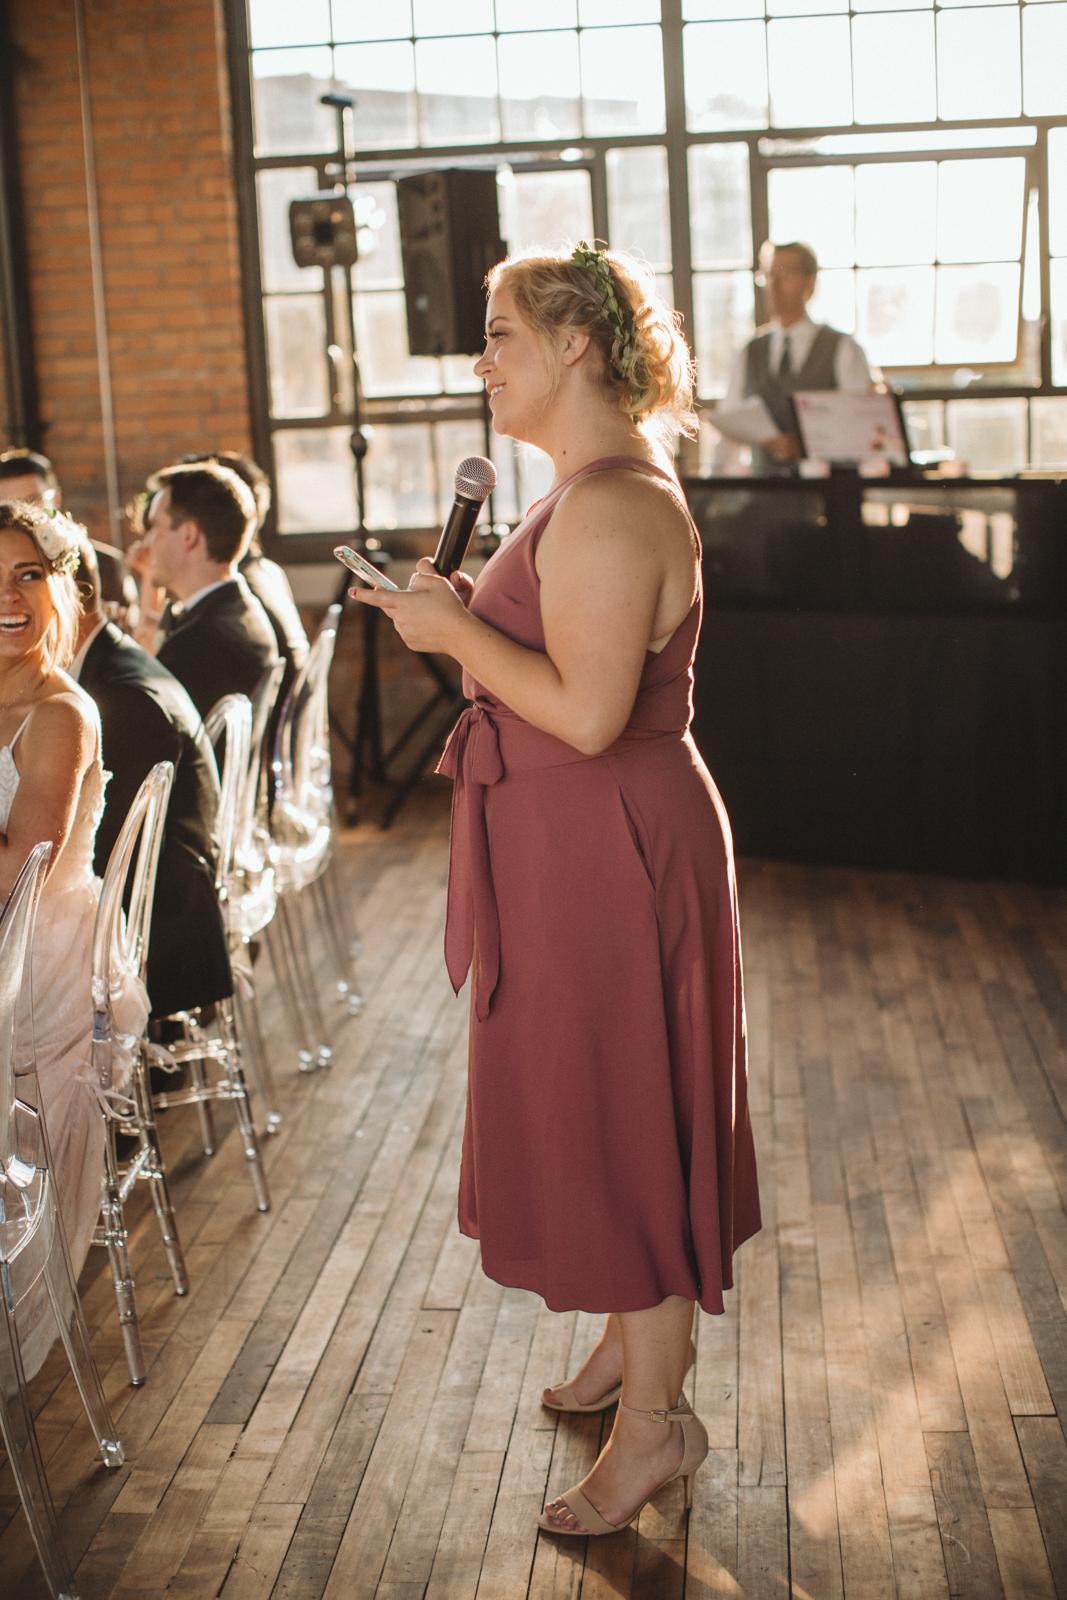 BeanandCole.com-Chris&JackieJohnson-Wedding-231.jpg